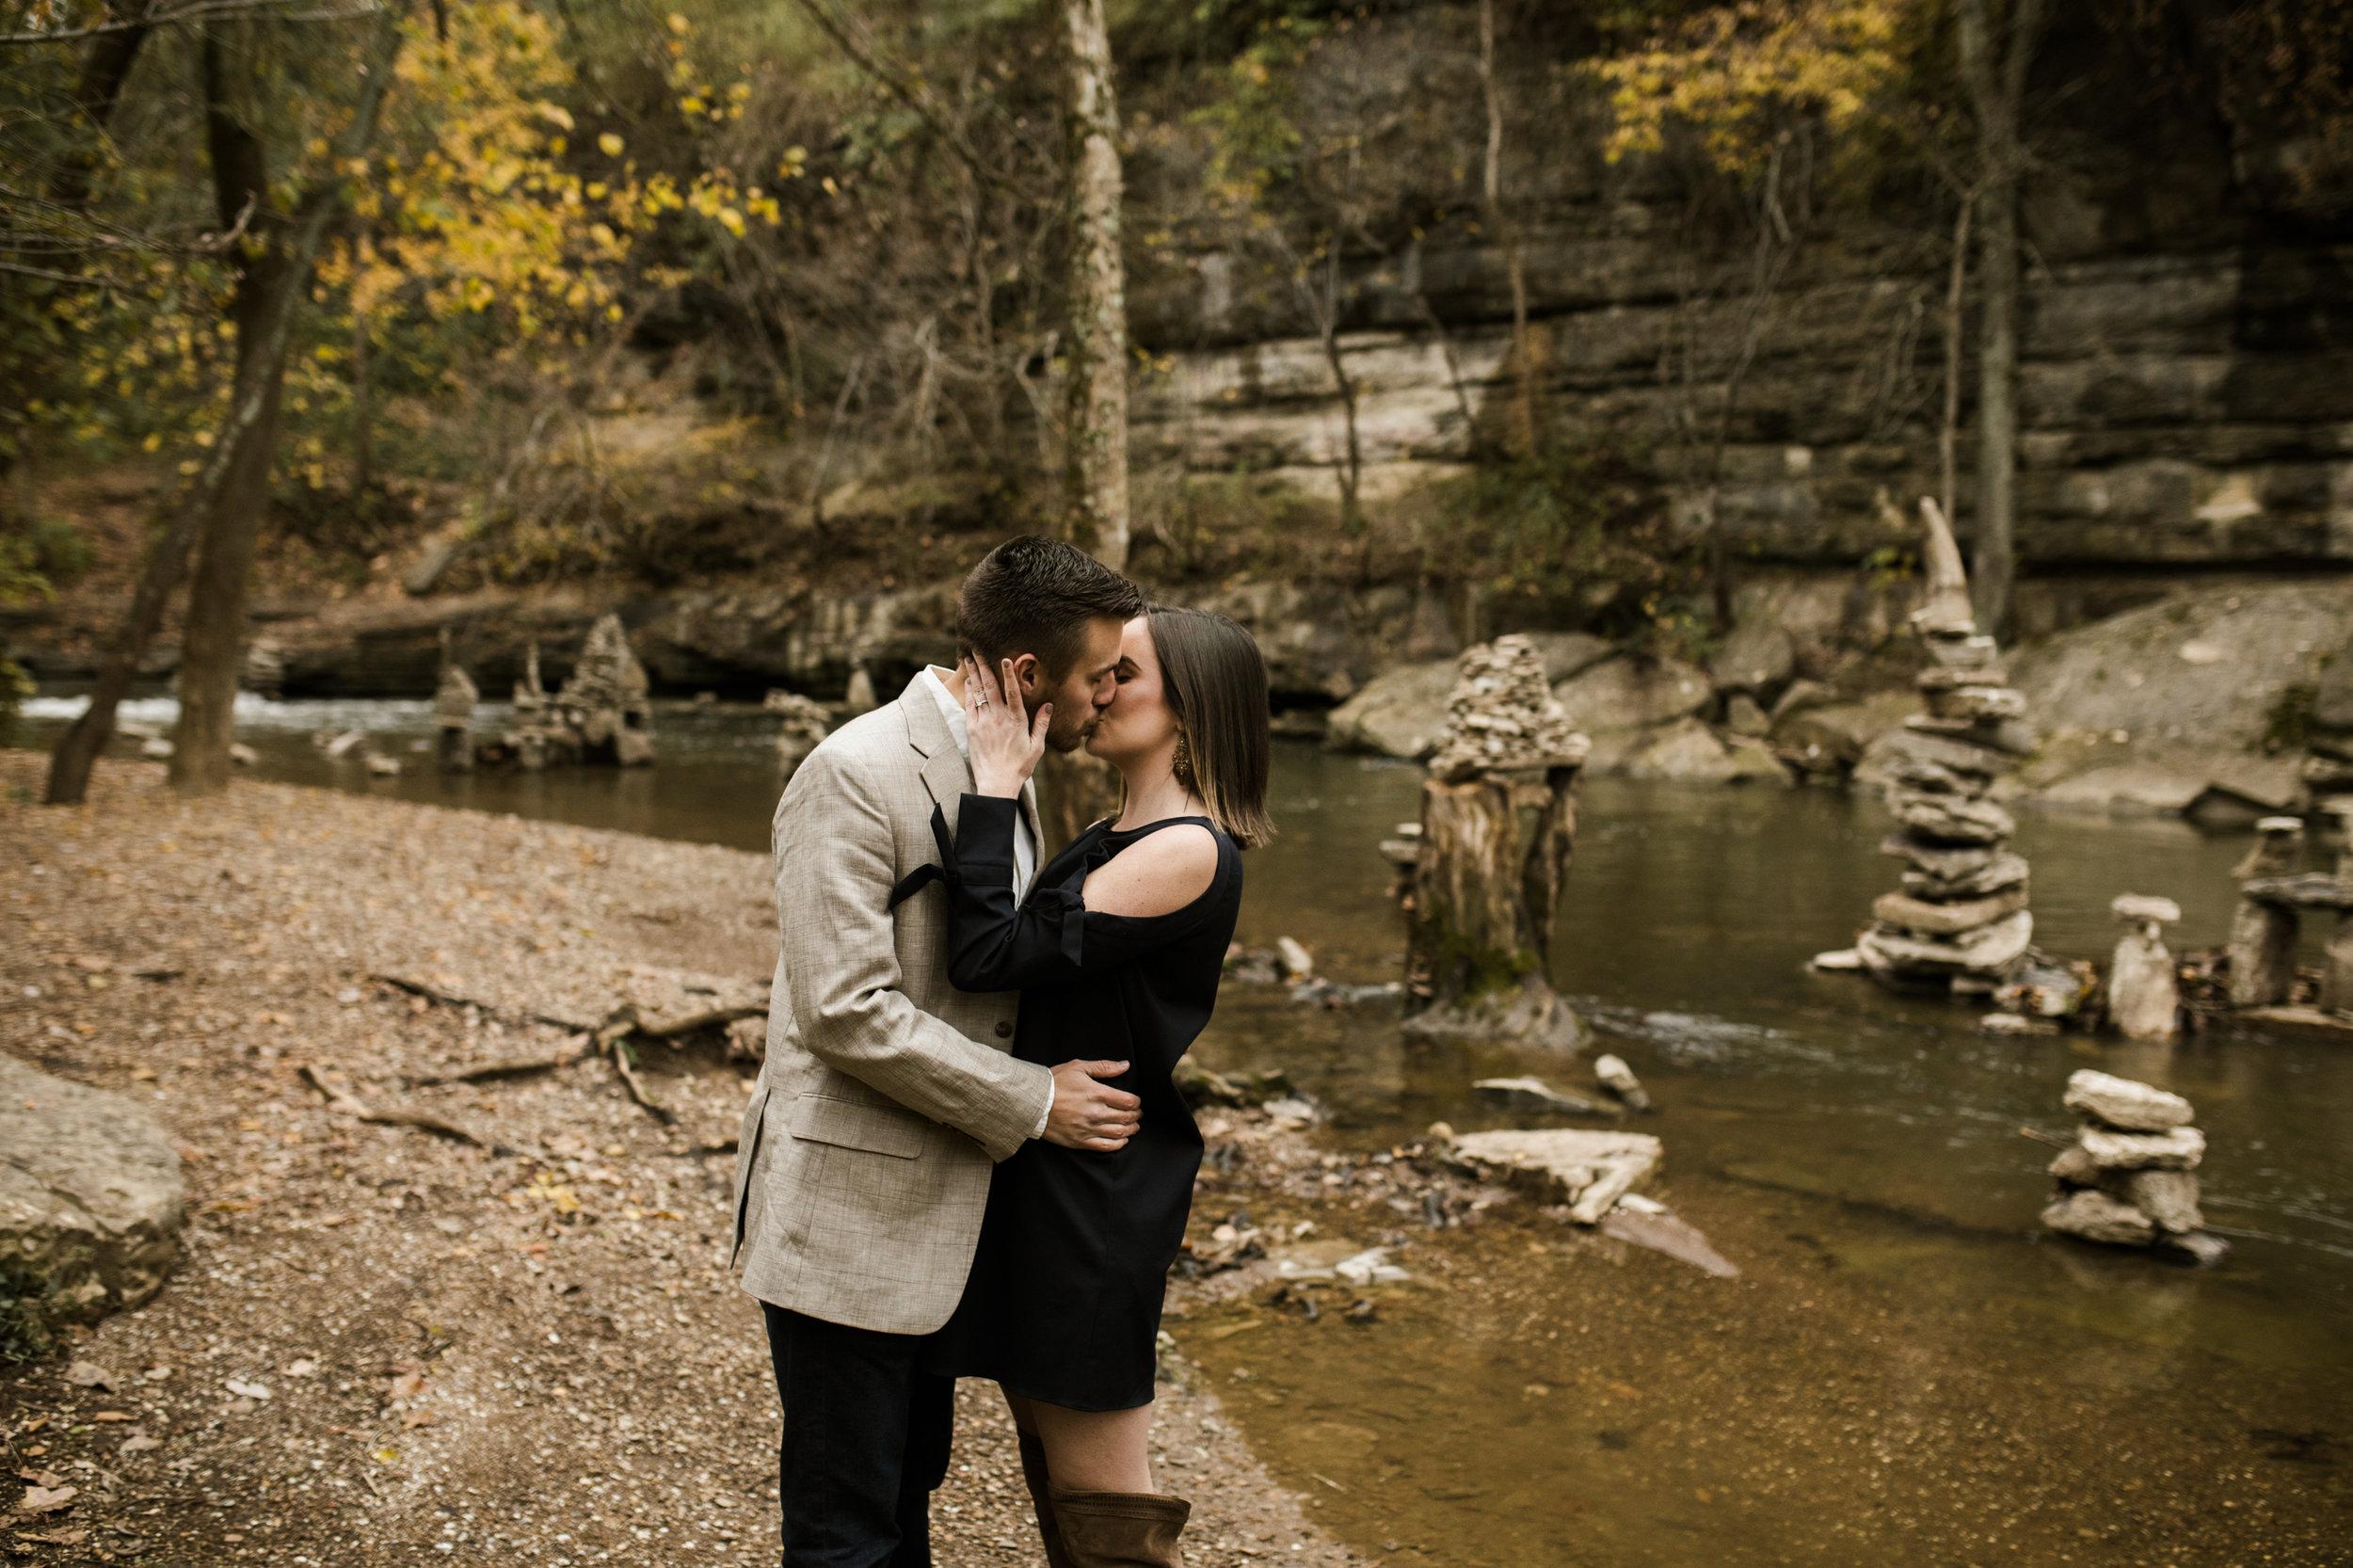 Kelsey and Daniel Engagement 2018 Crystal Ludwick Photo Louisville Wedding Photographer Kentucky Wedding Photographer (19 of 31).jpg